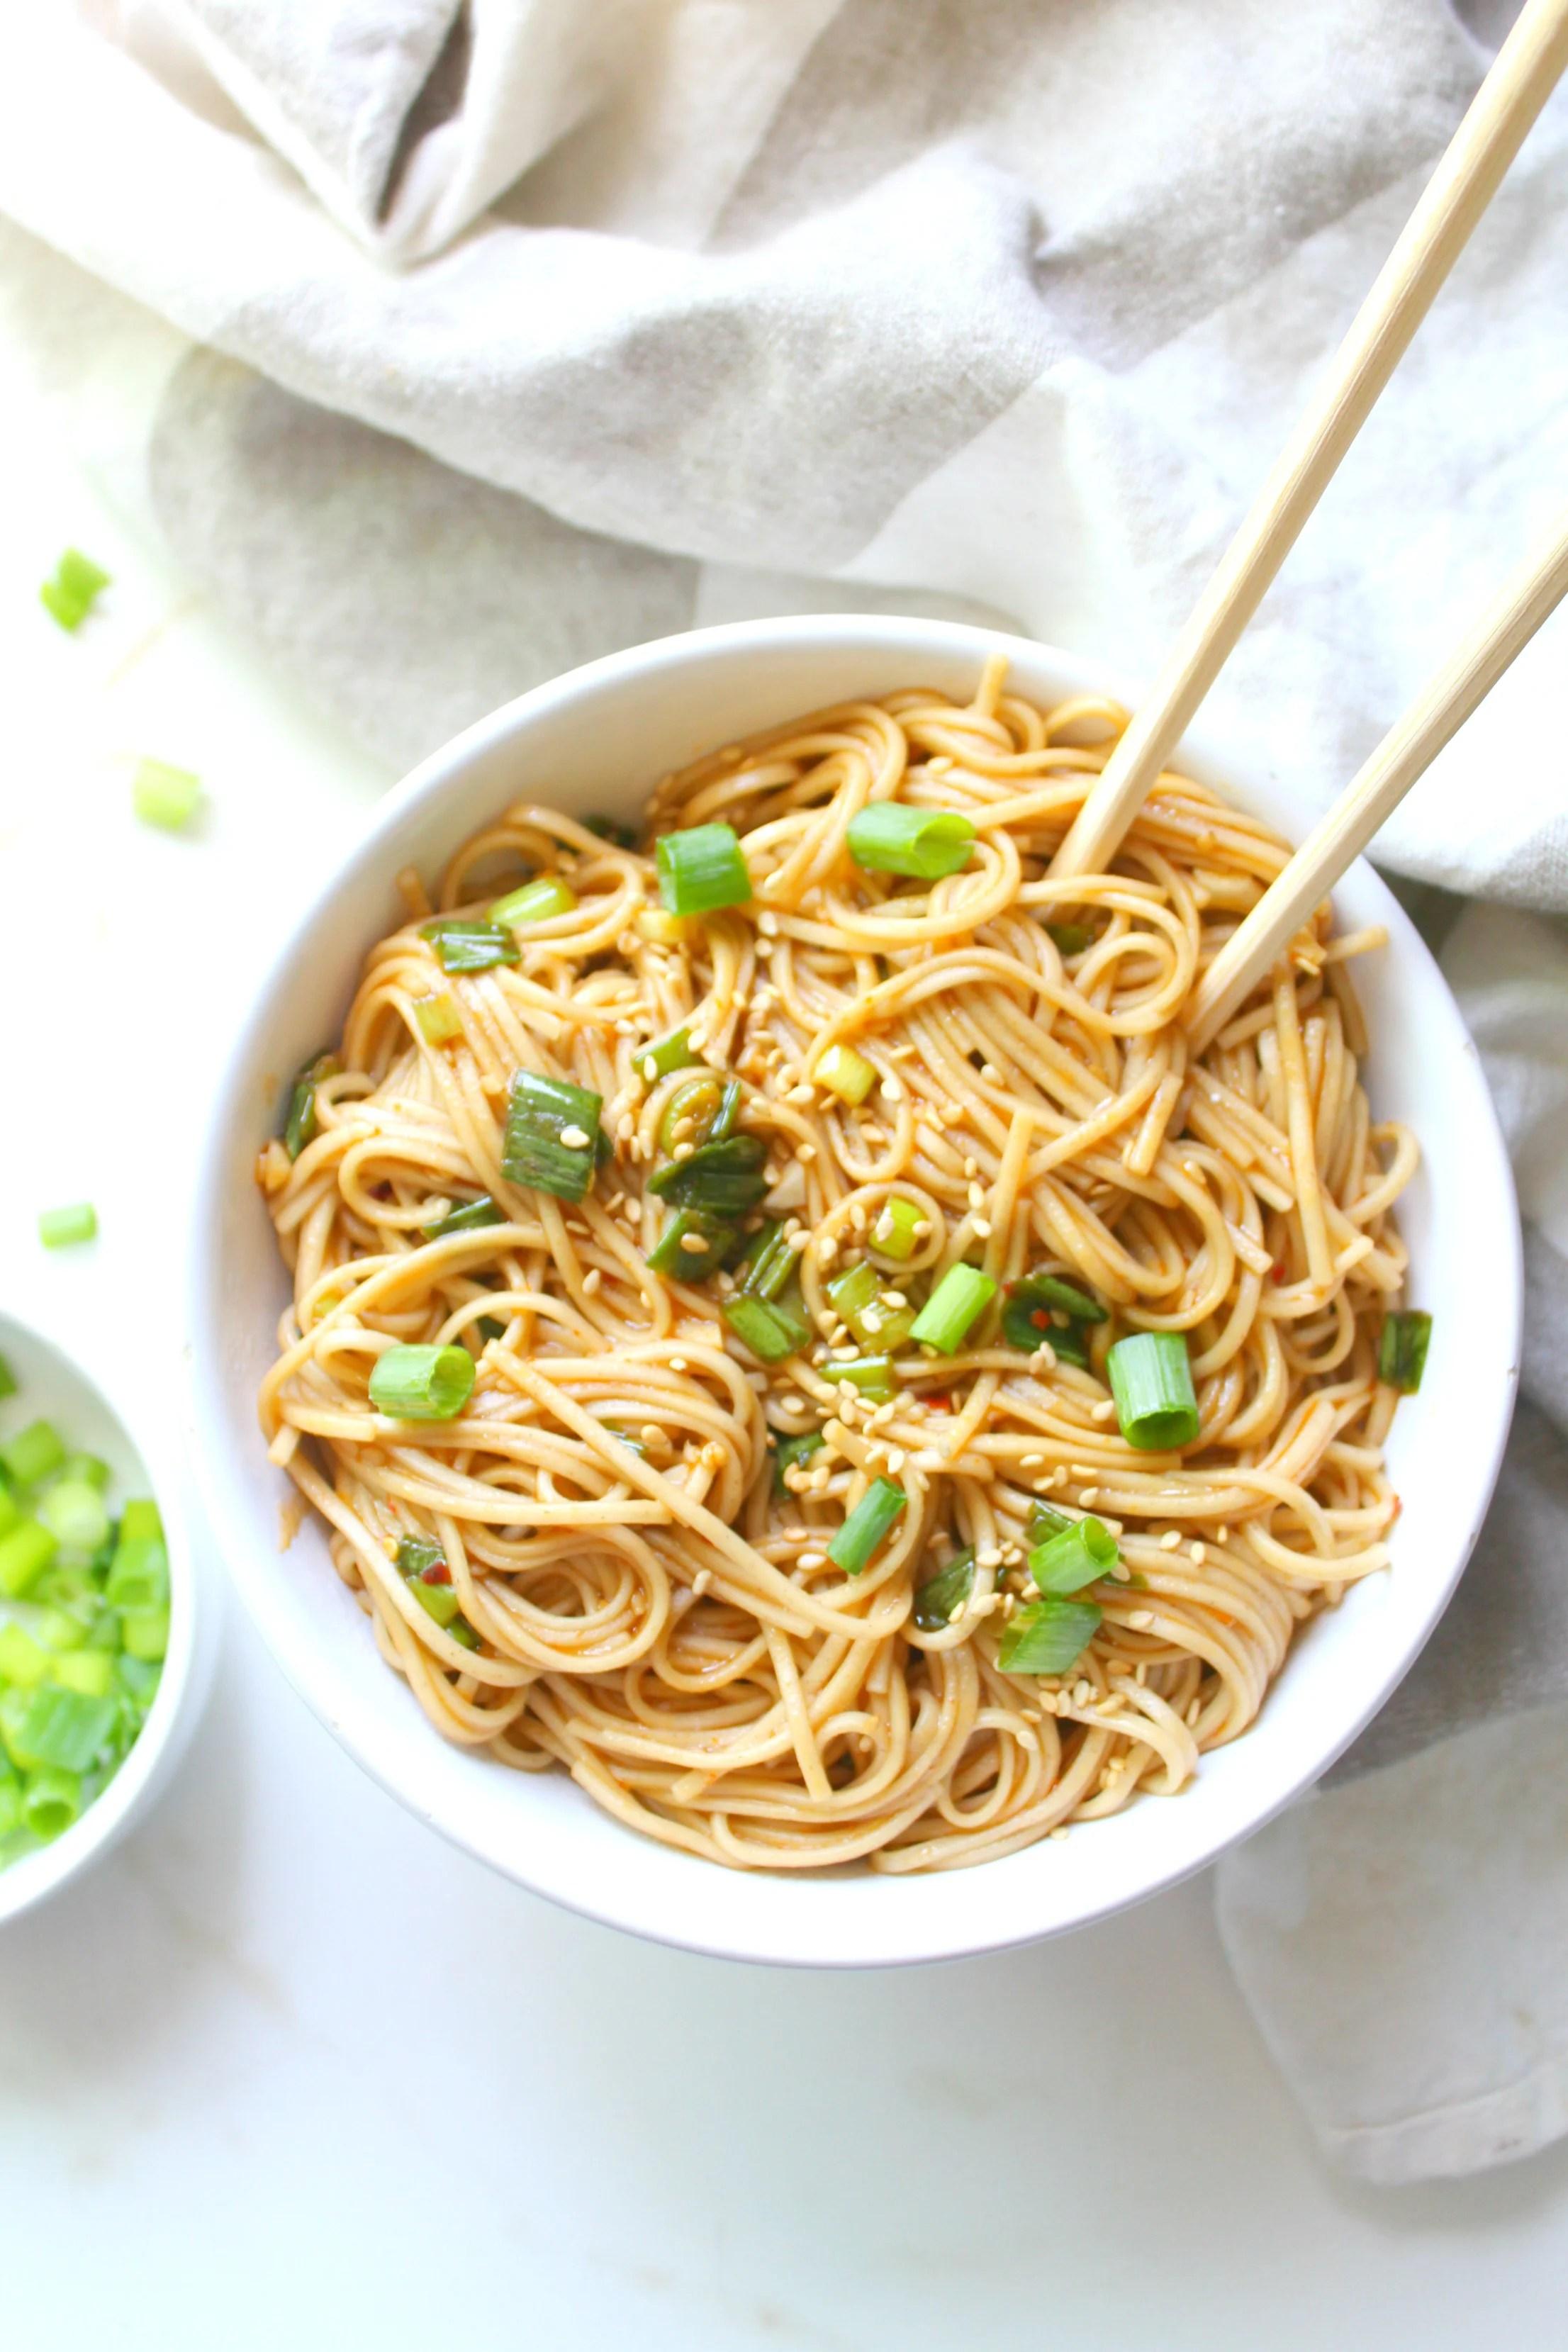 Simple Sesame Ginger Soba Noodles | This Savory Vegan